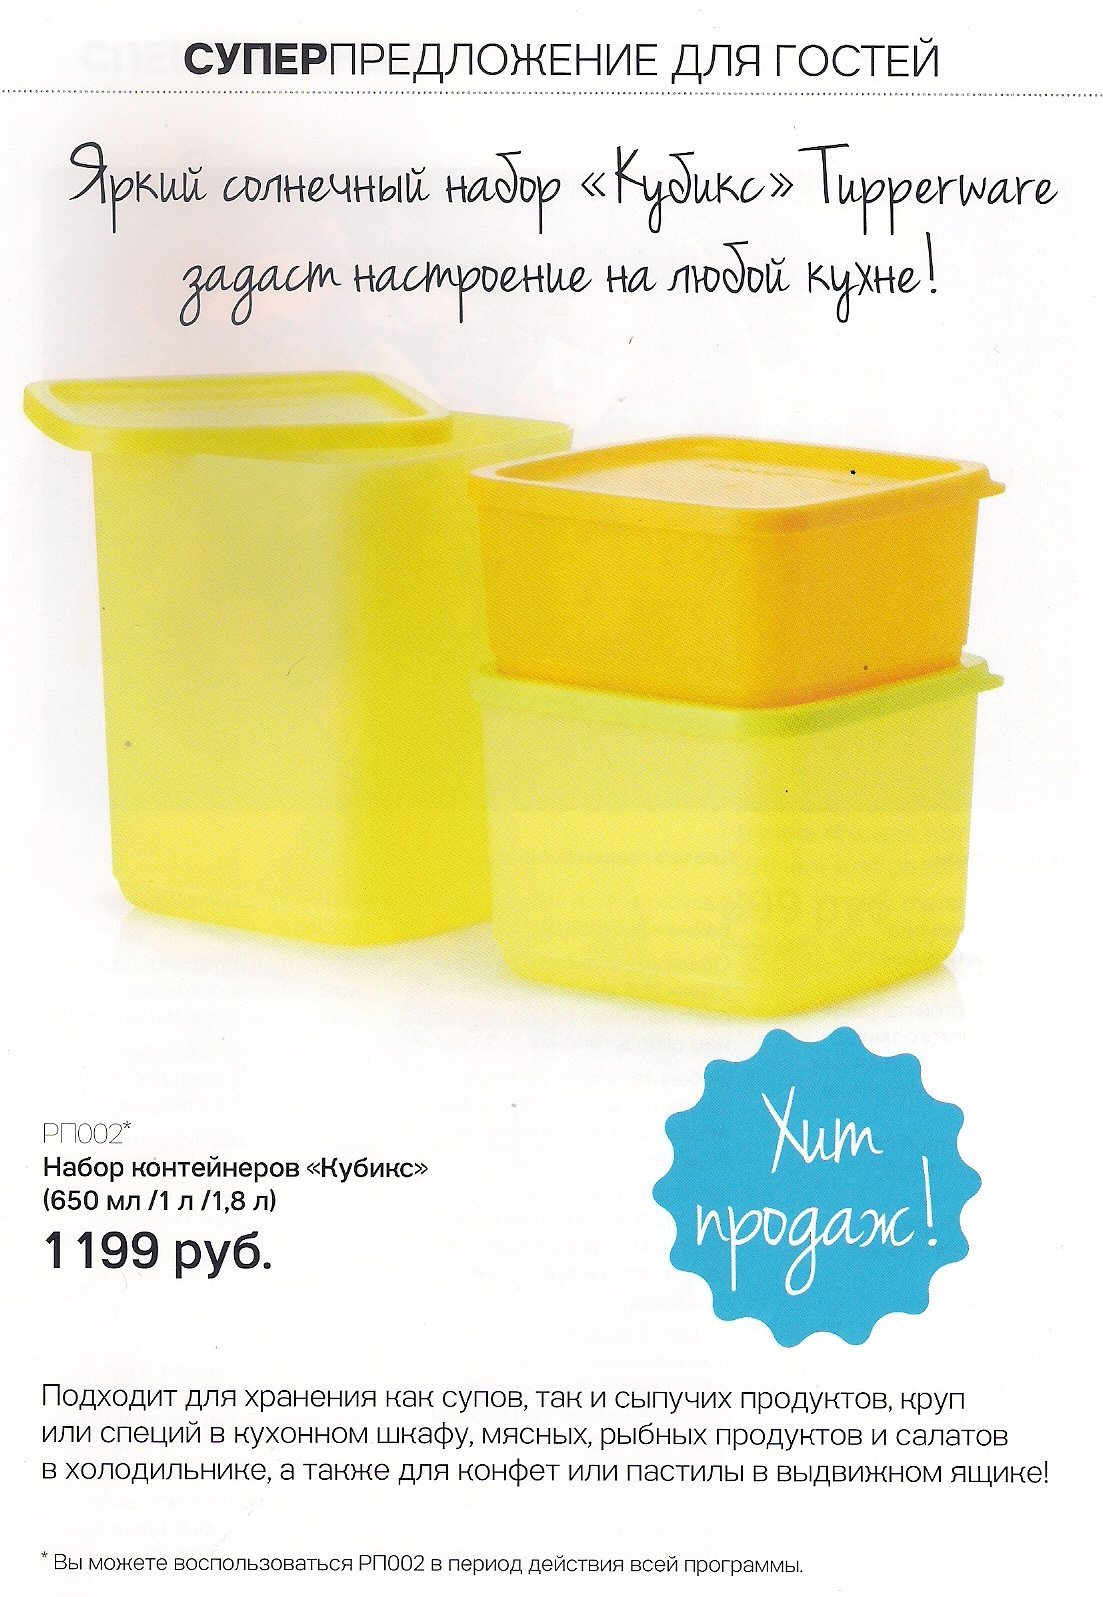 http://tupperware-online.ru/images/upload/5g.jpg